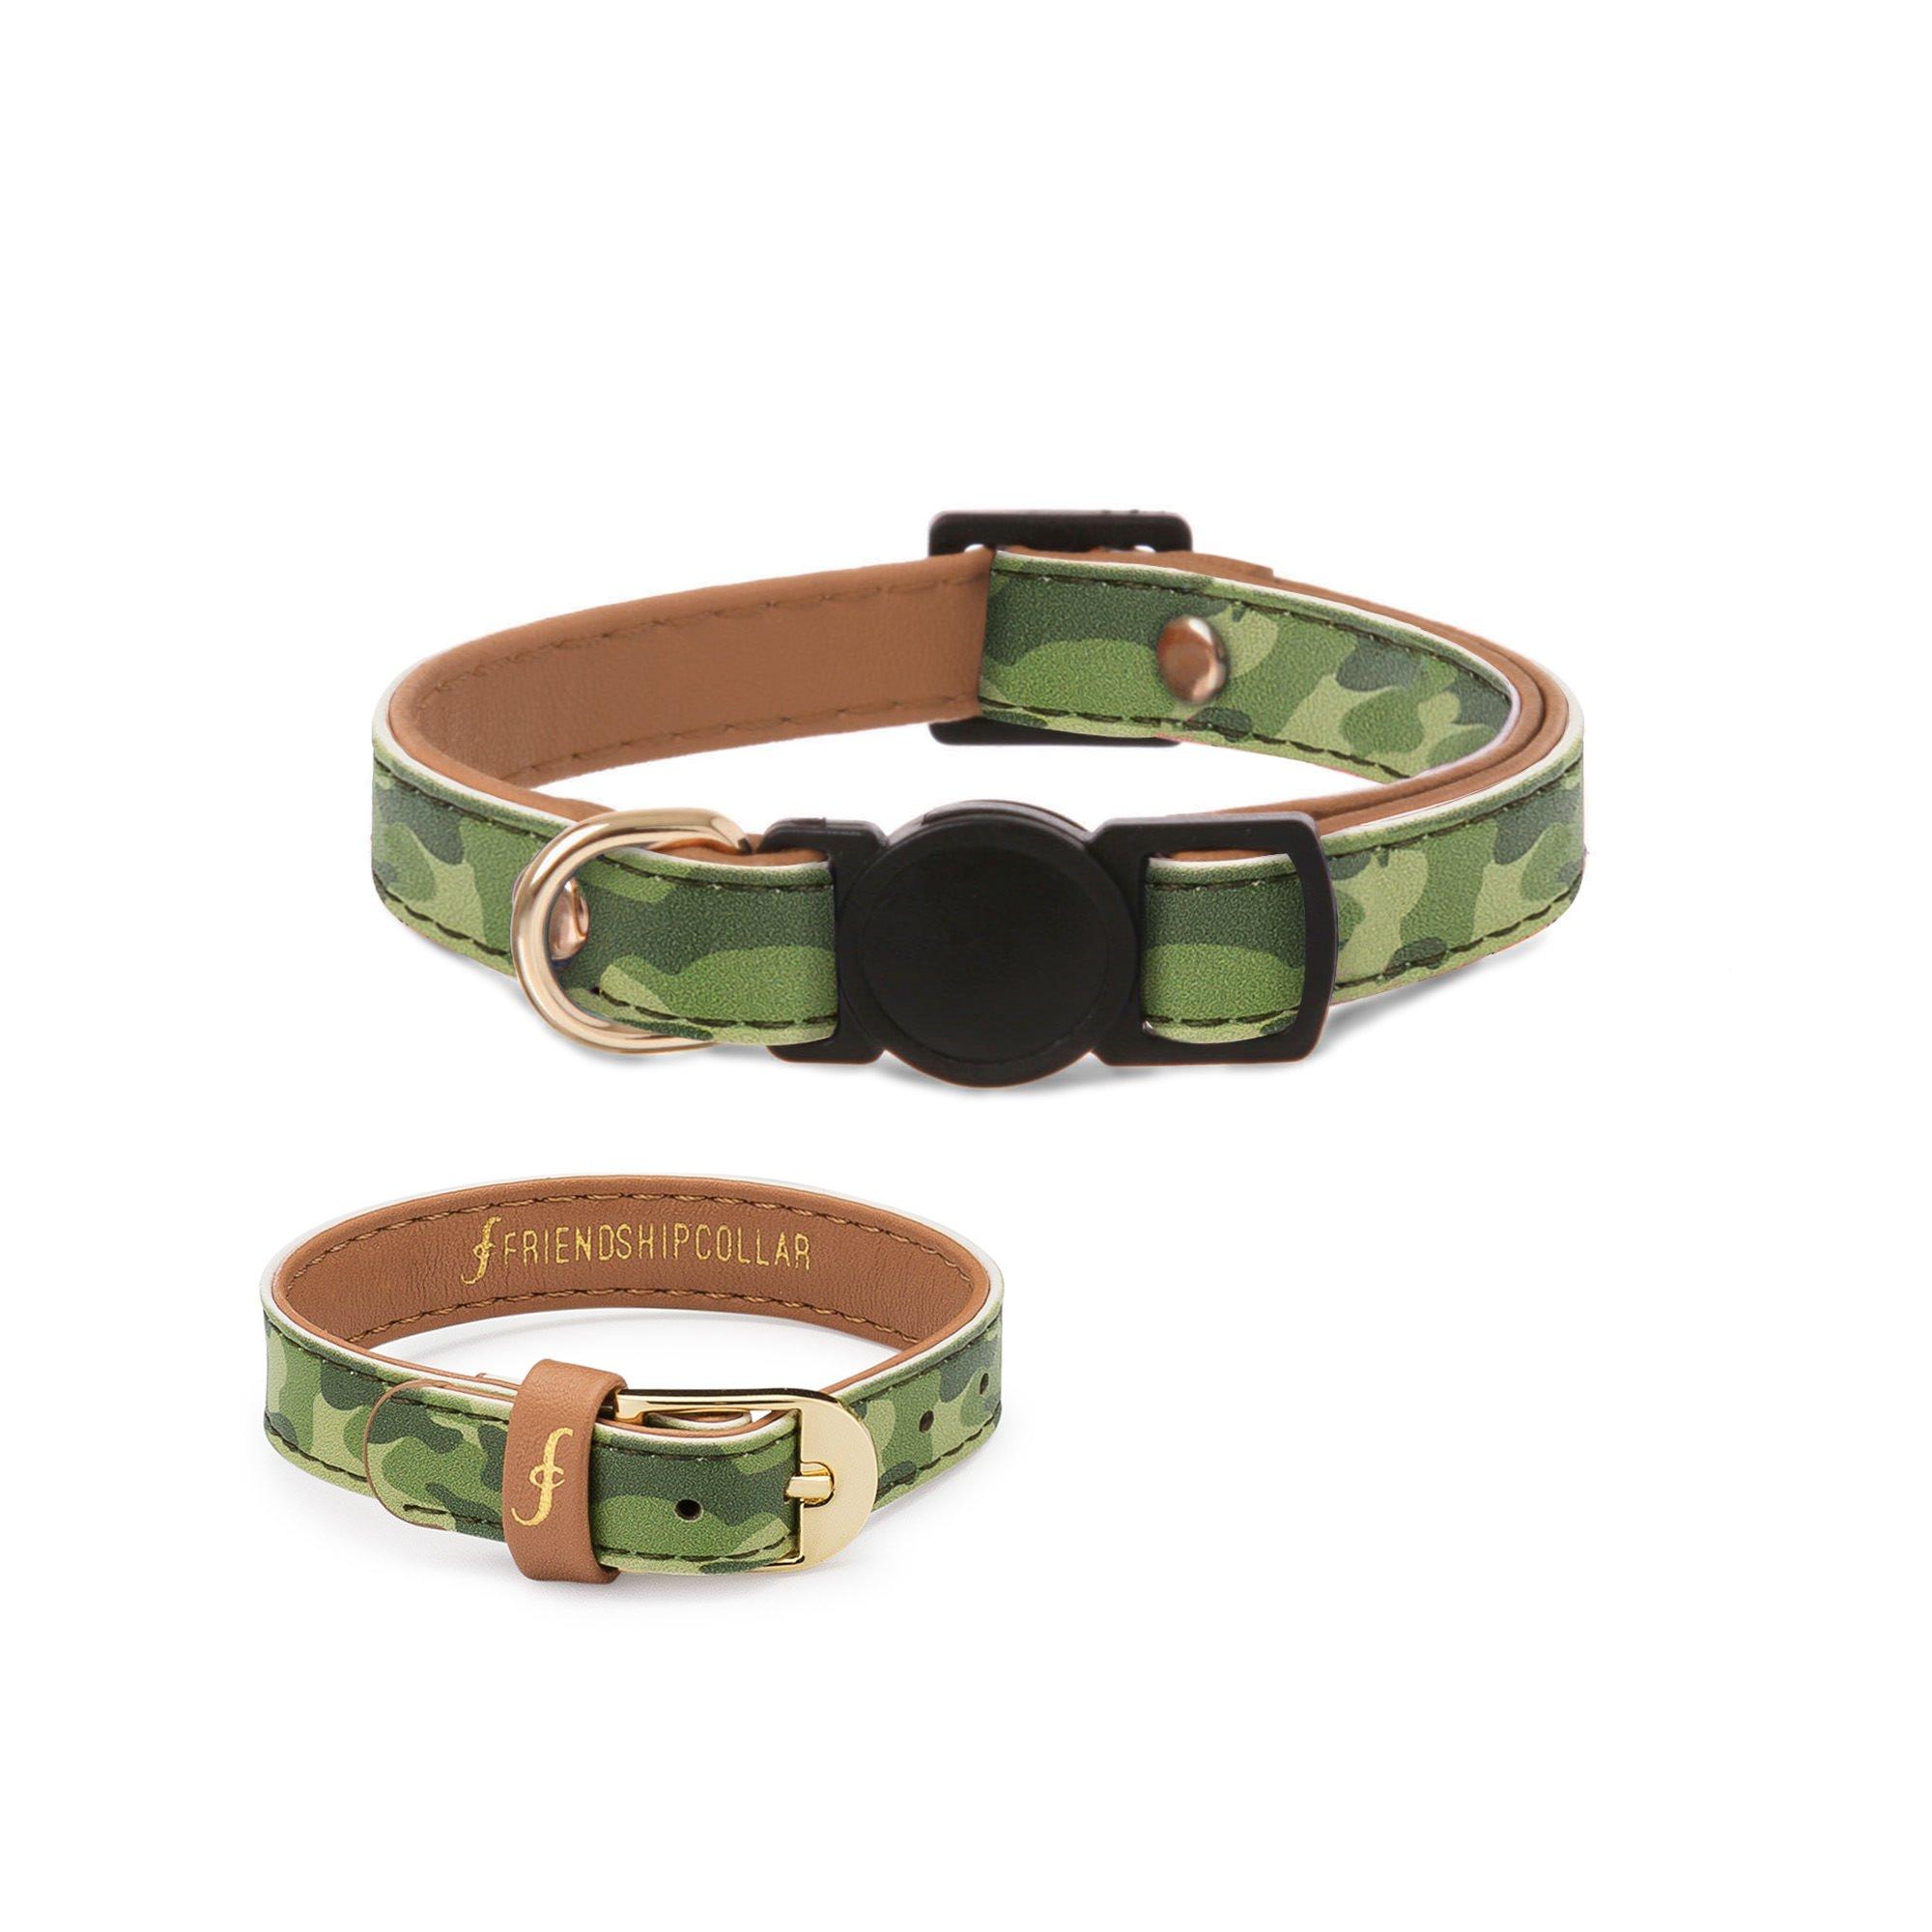 FriendshipCollar Cat Collar and Friendship Bracelet - SGT Mog